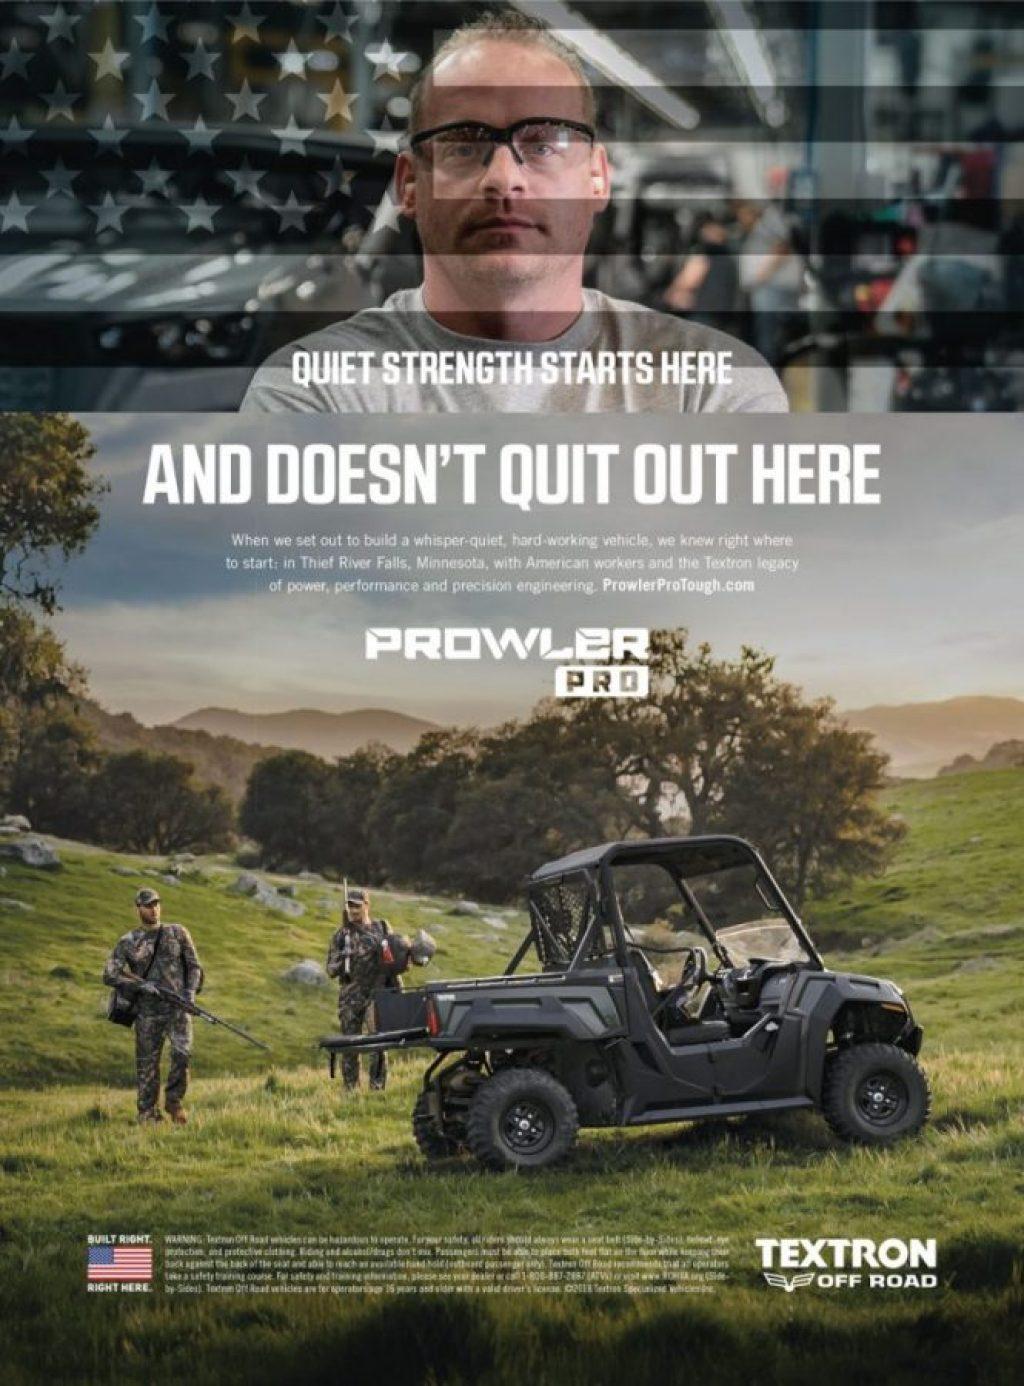 Prowler Pro